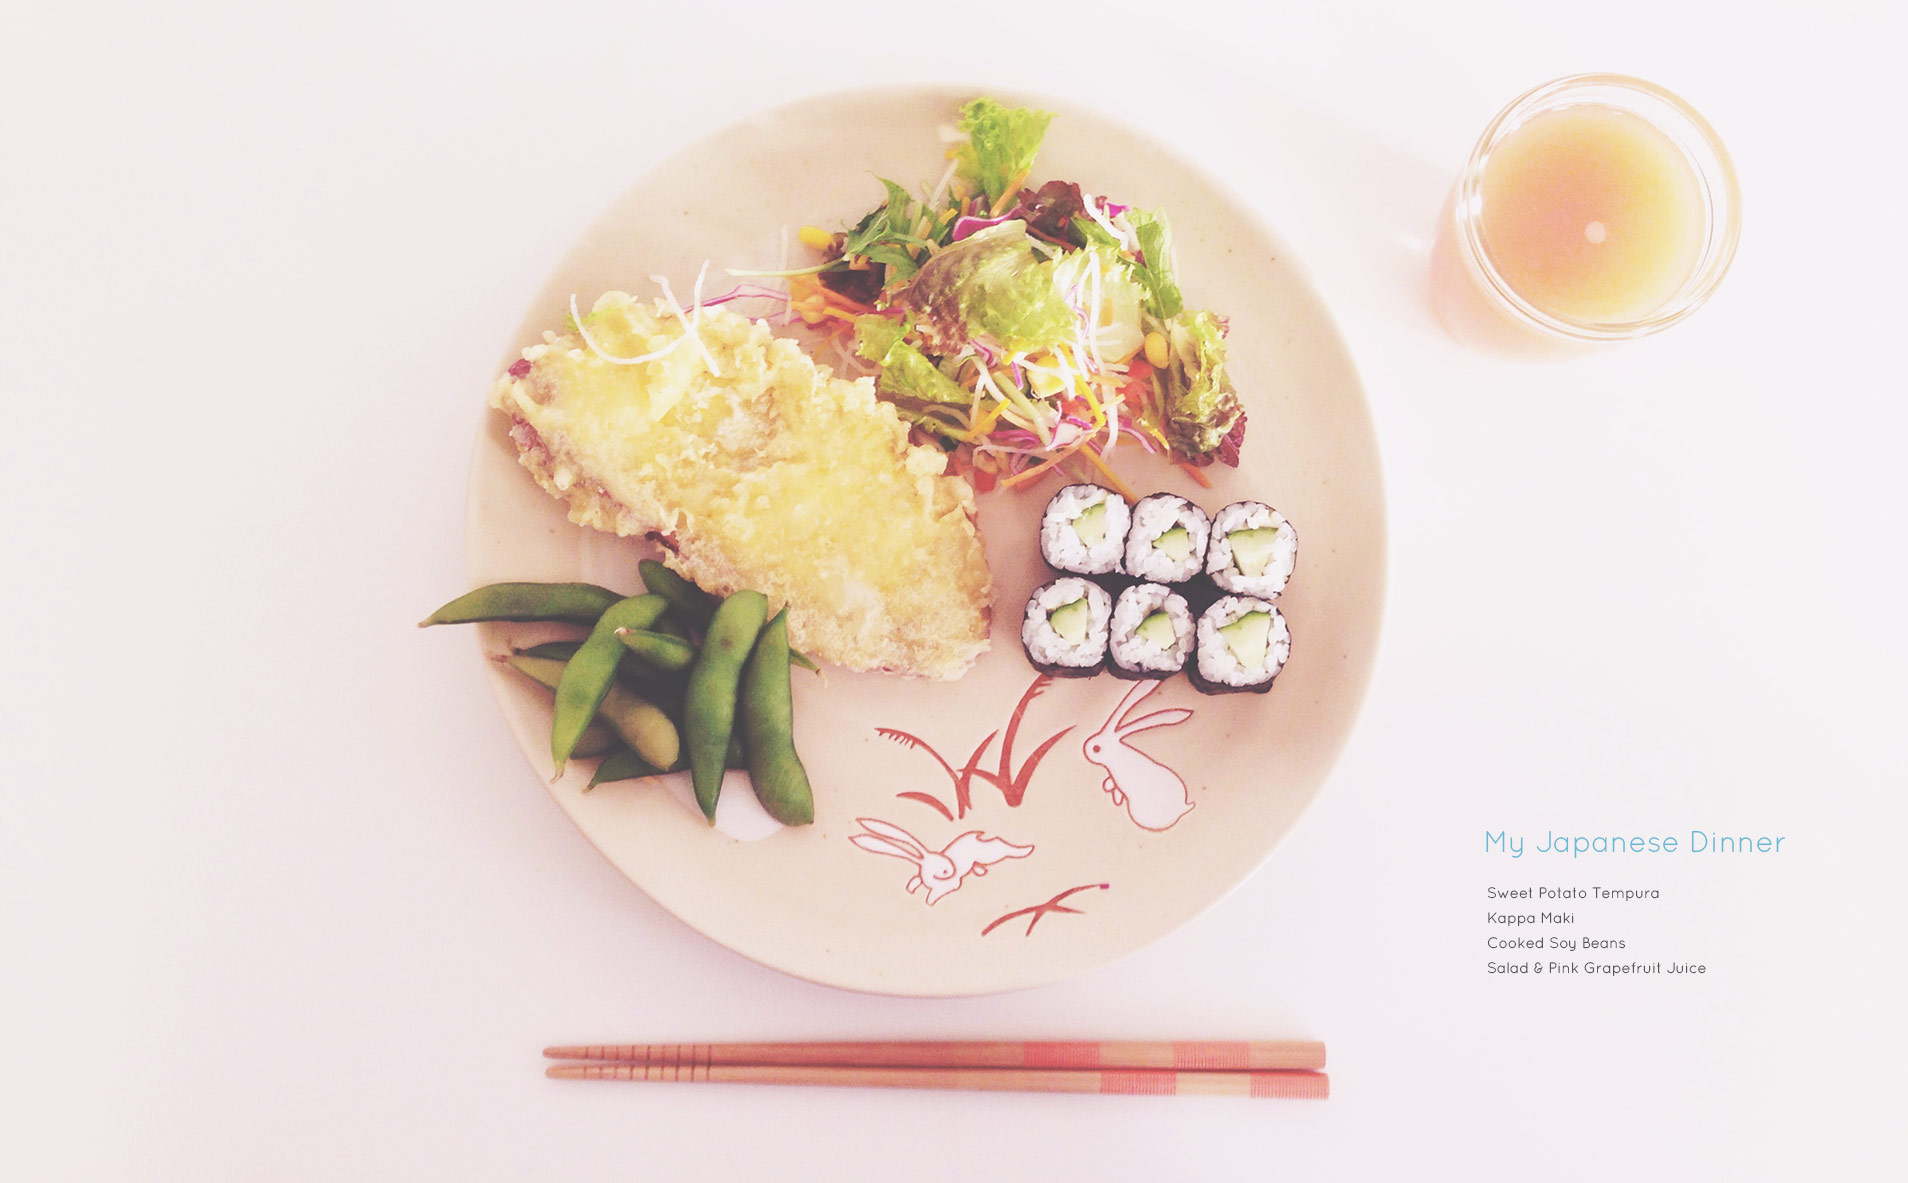 My Japanese Dinner